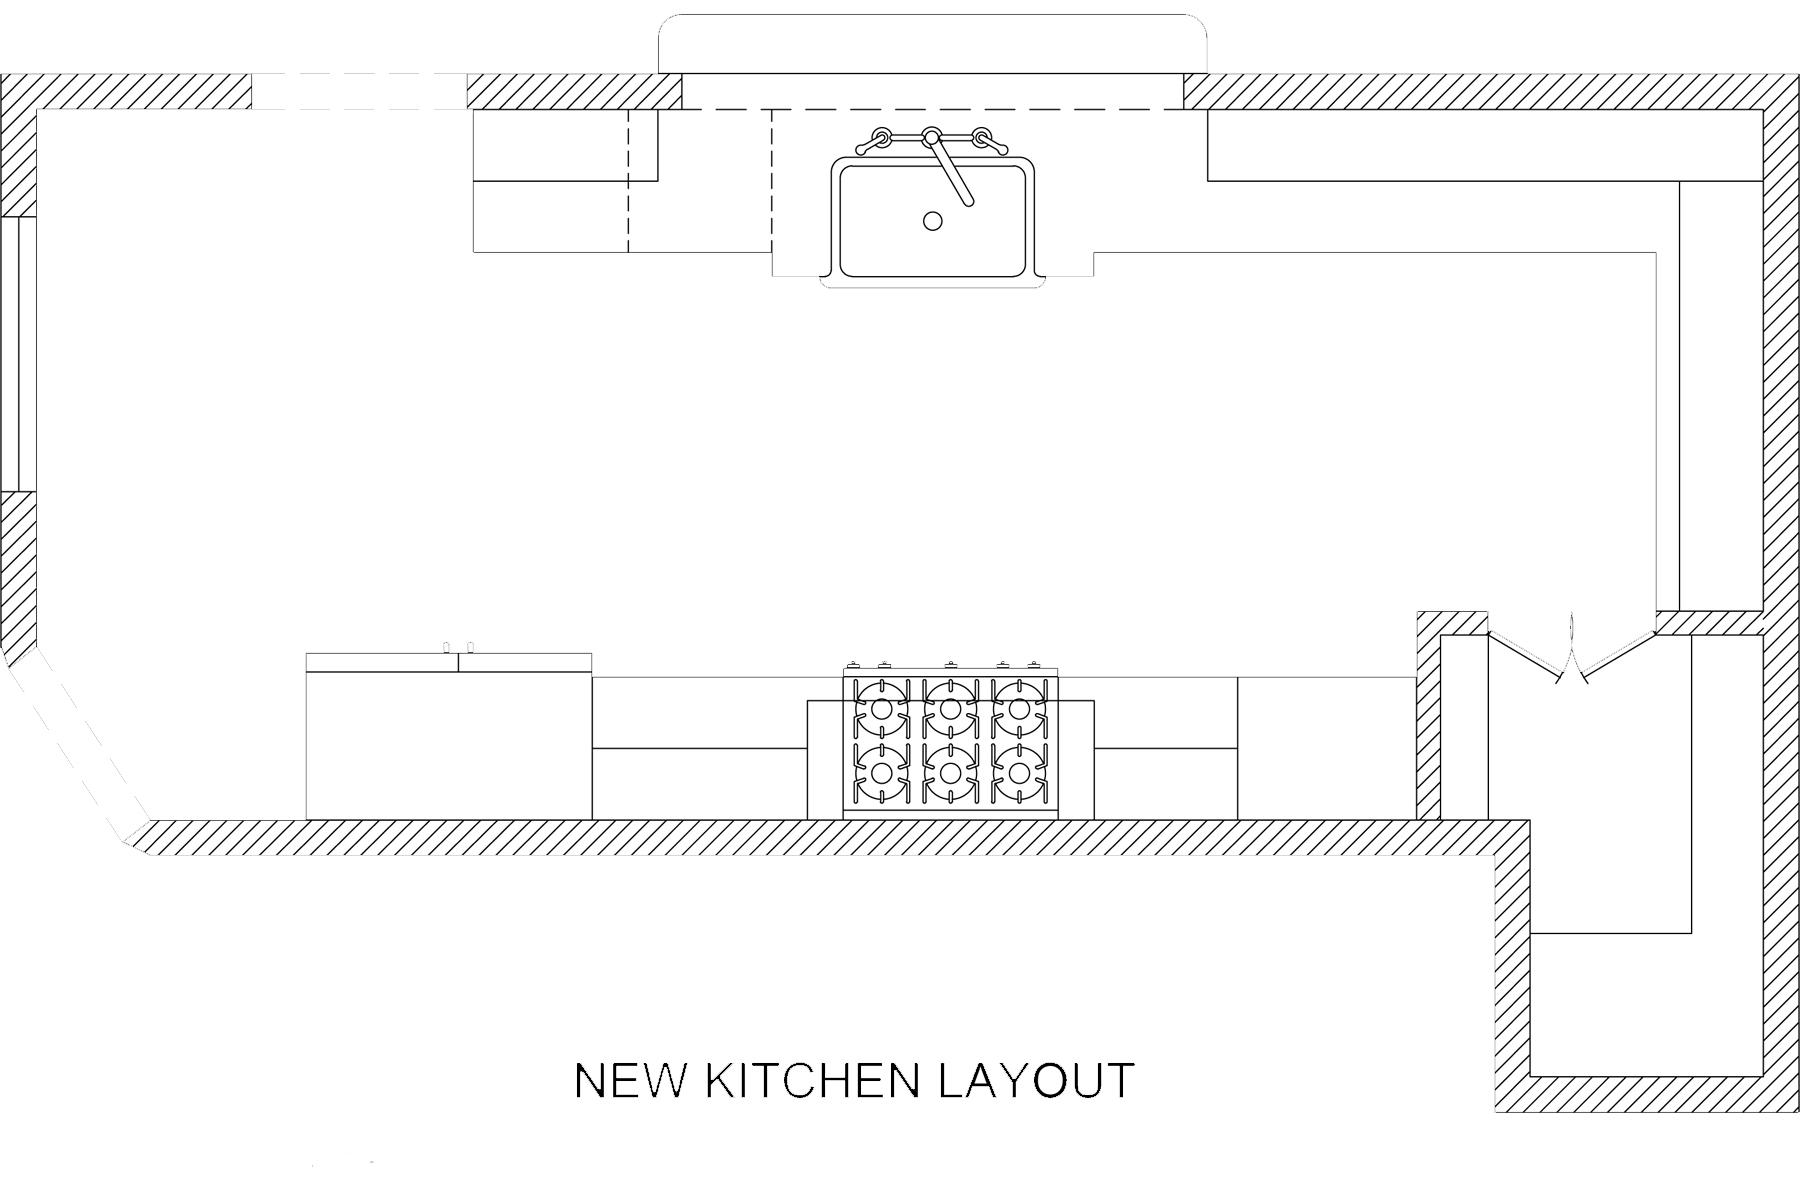 Floor-plan by Jamie House Design of new kitchen layout